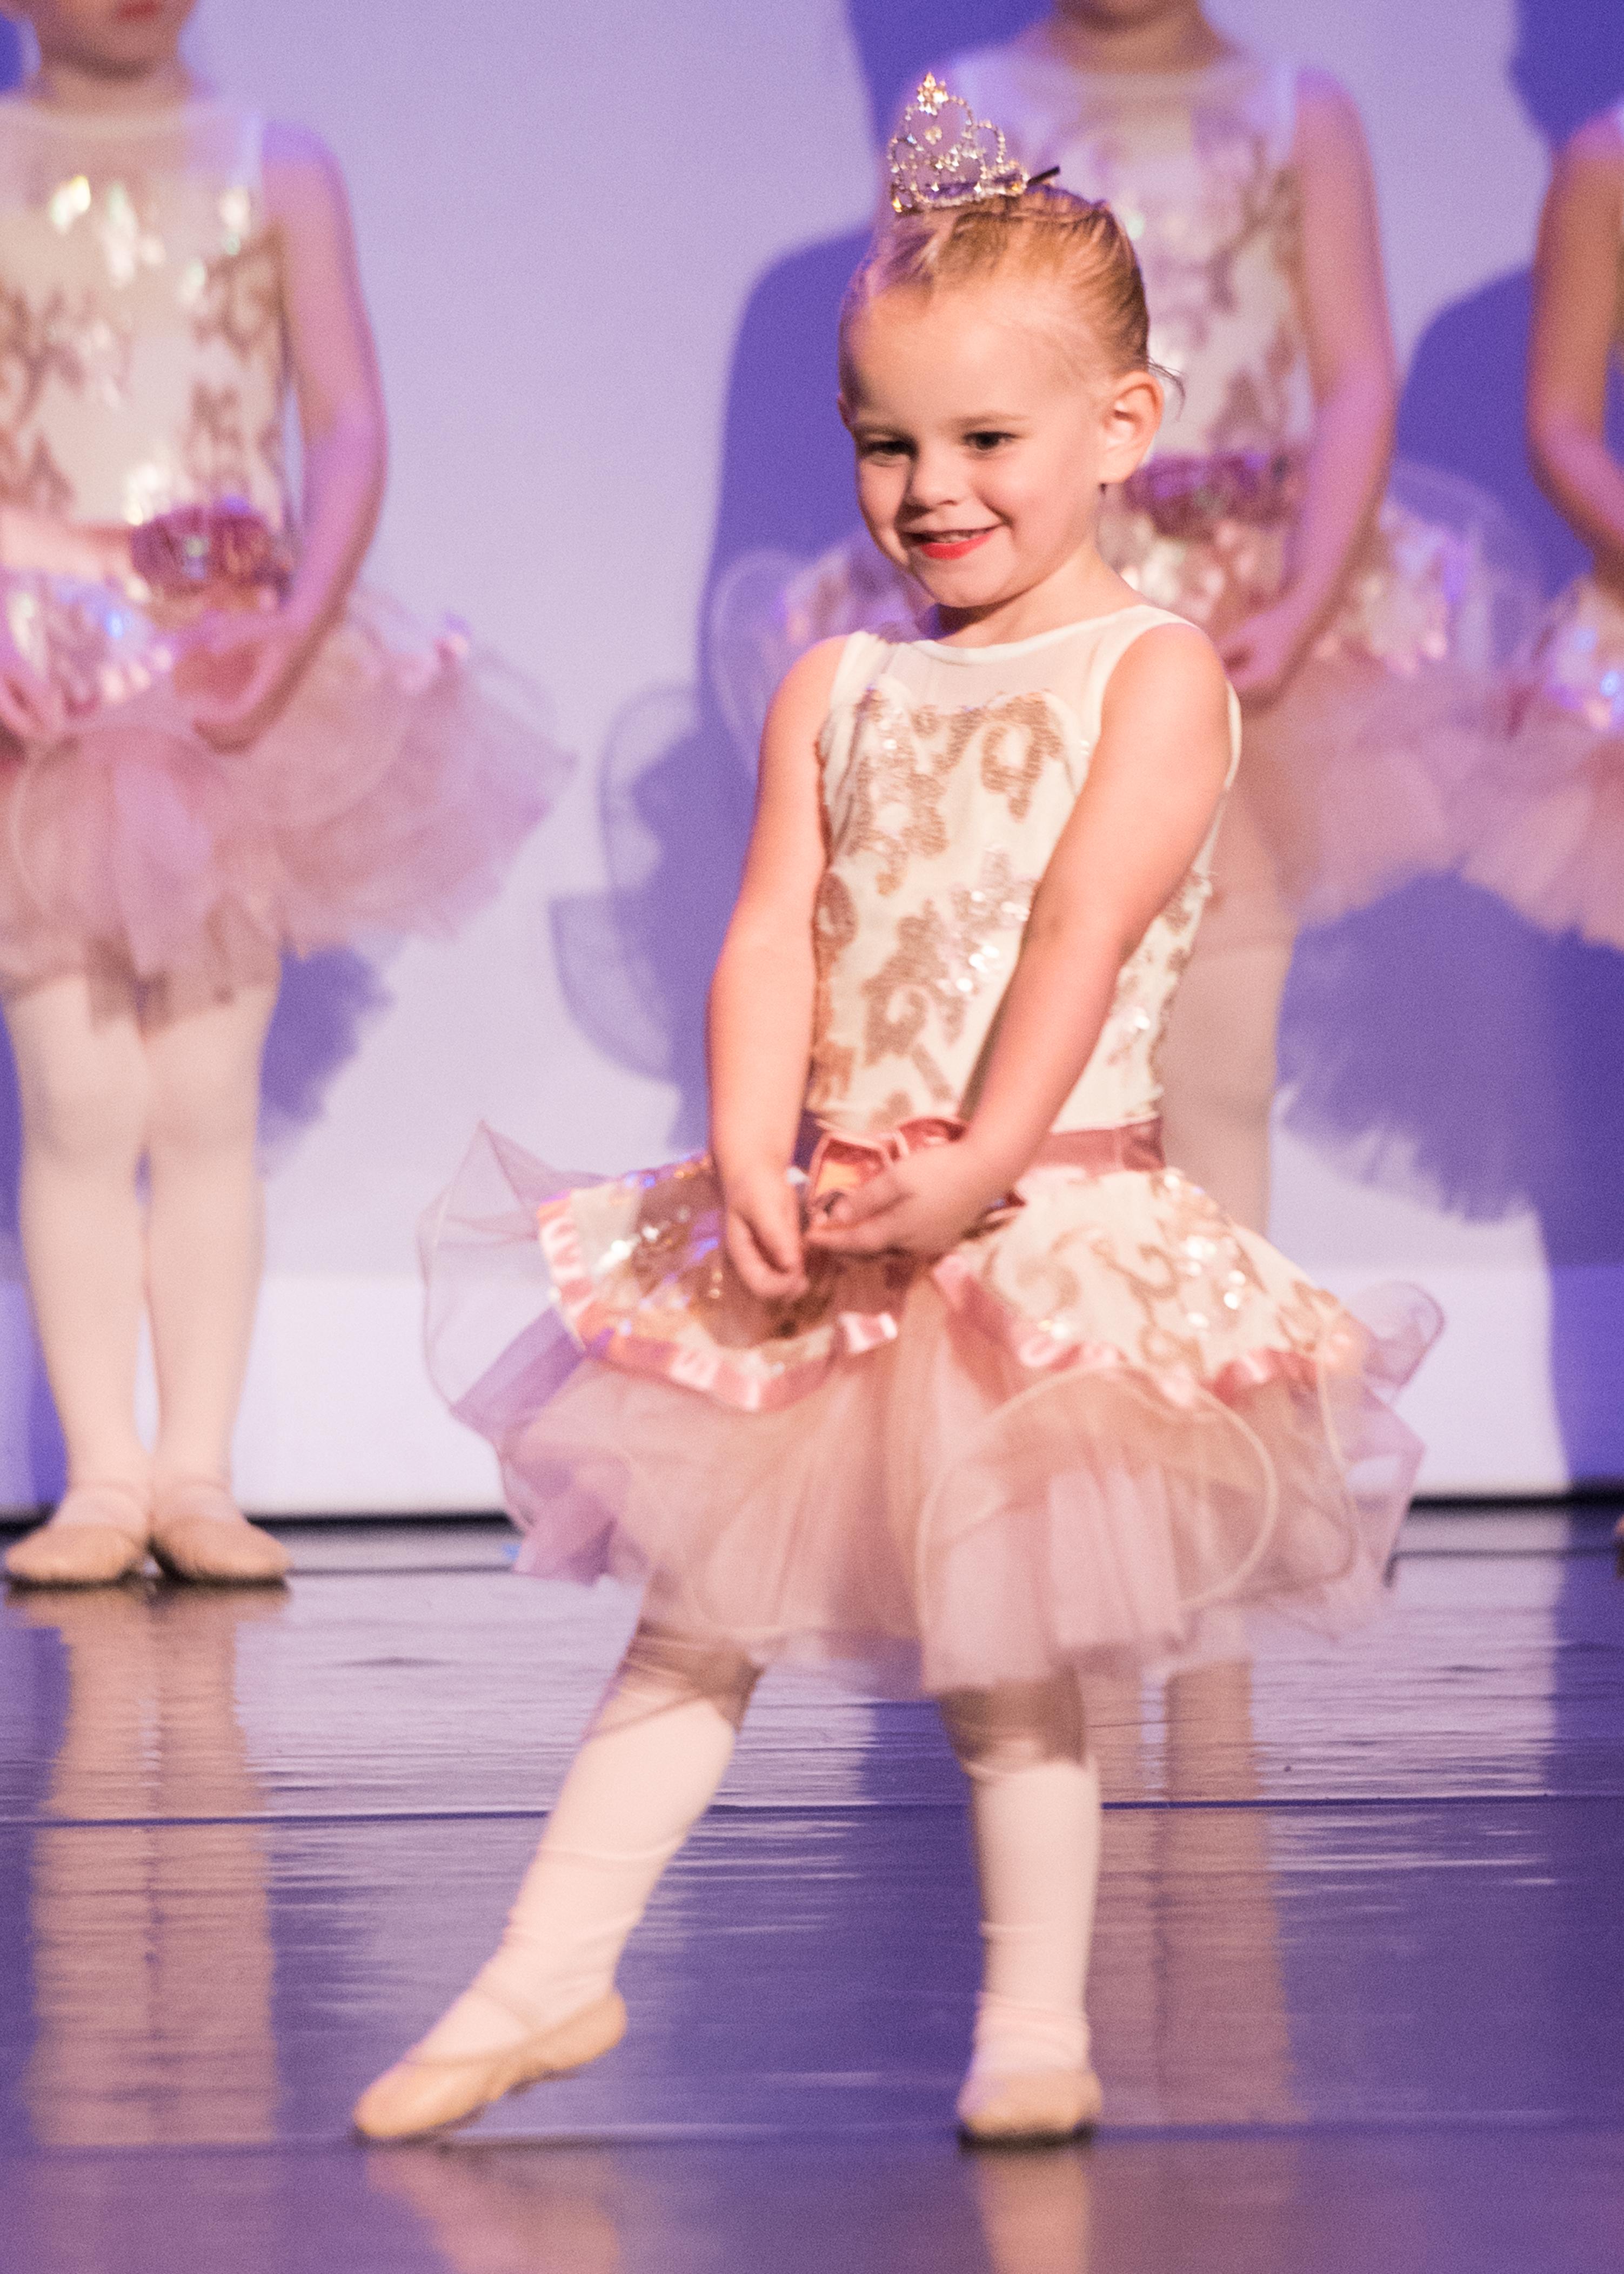 Petite Dancer: Early Childhood Programs